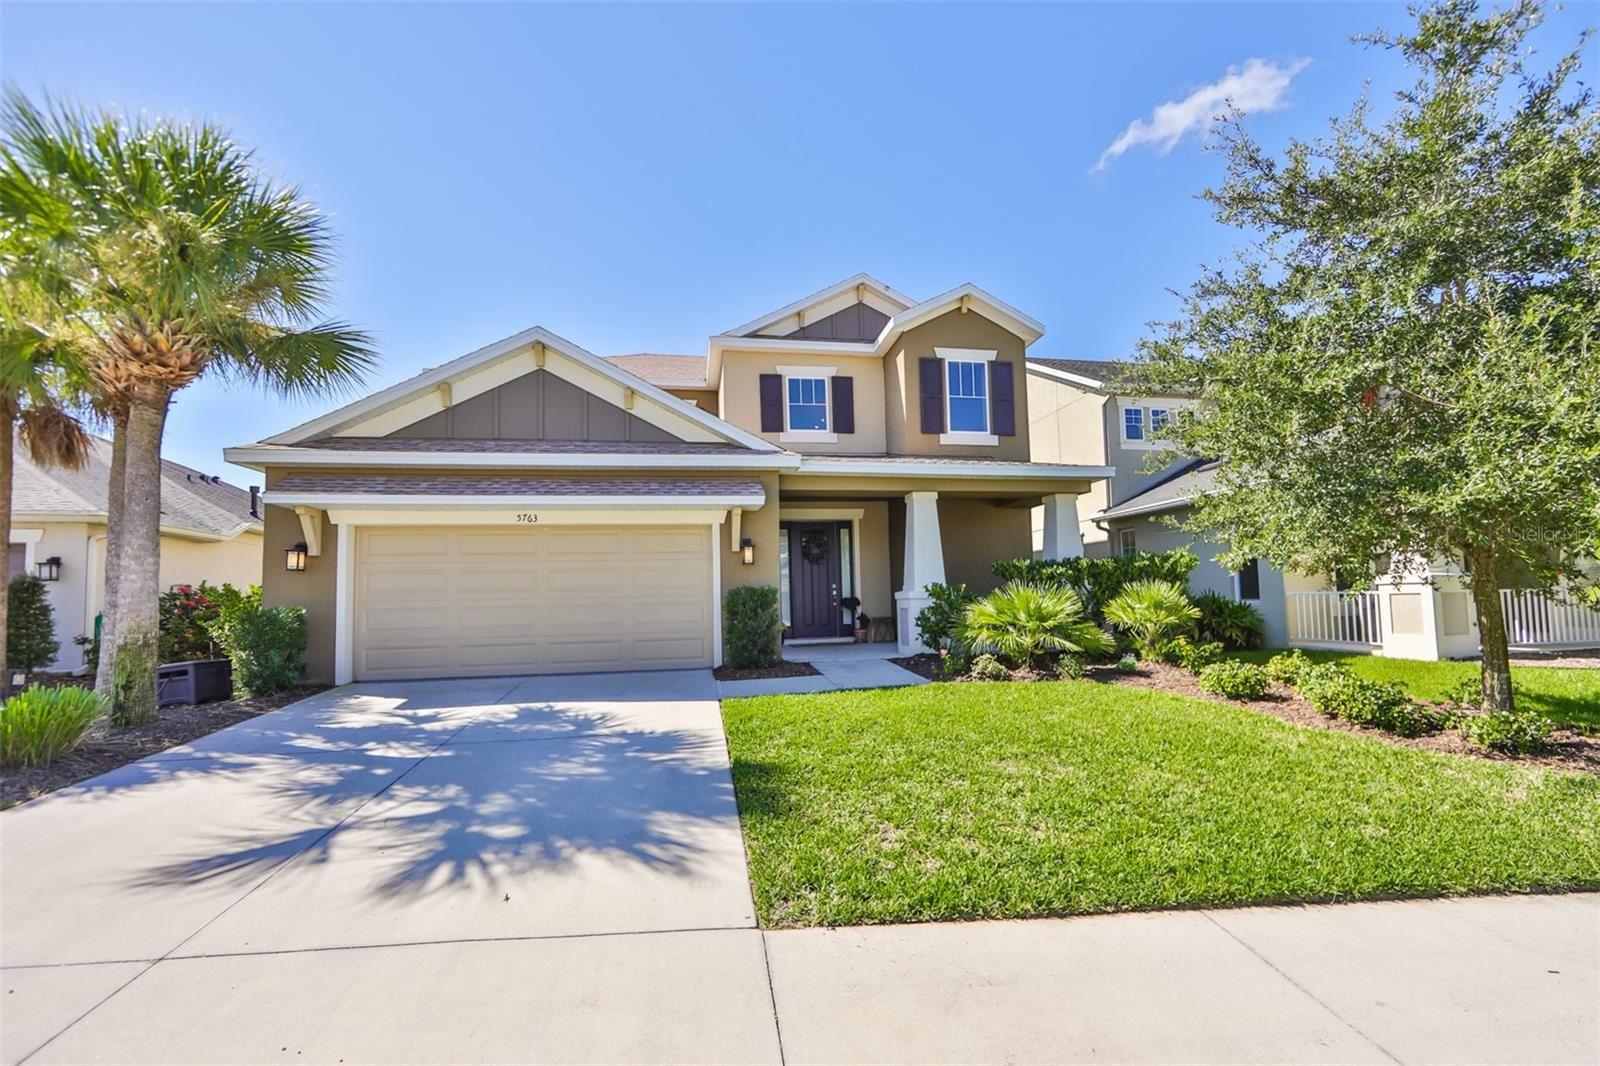 5763 LIATRIS CIRCLE, Sarasota, FL 34238 - #: A4513885